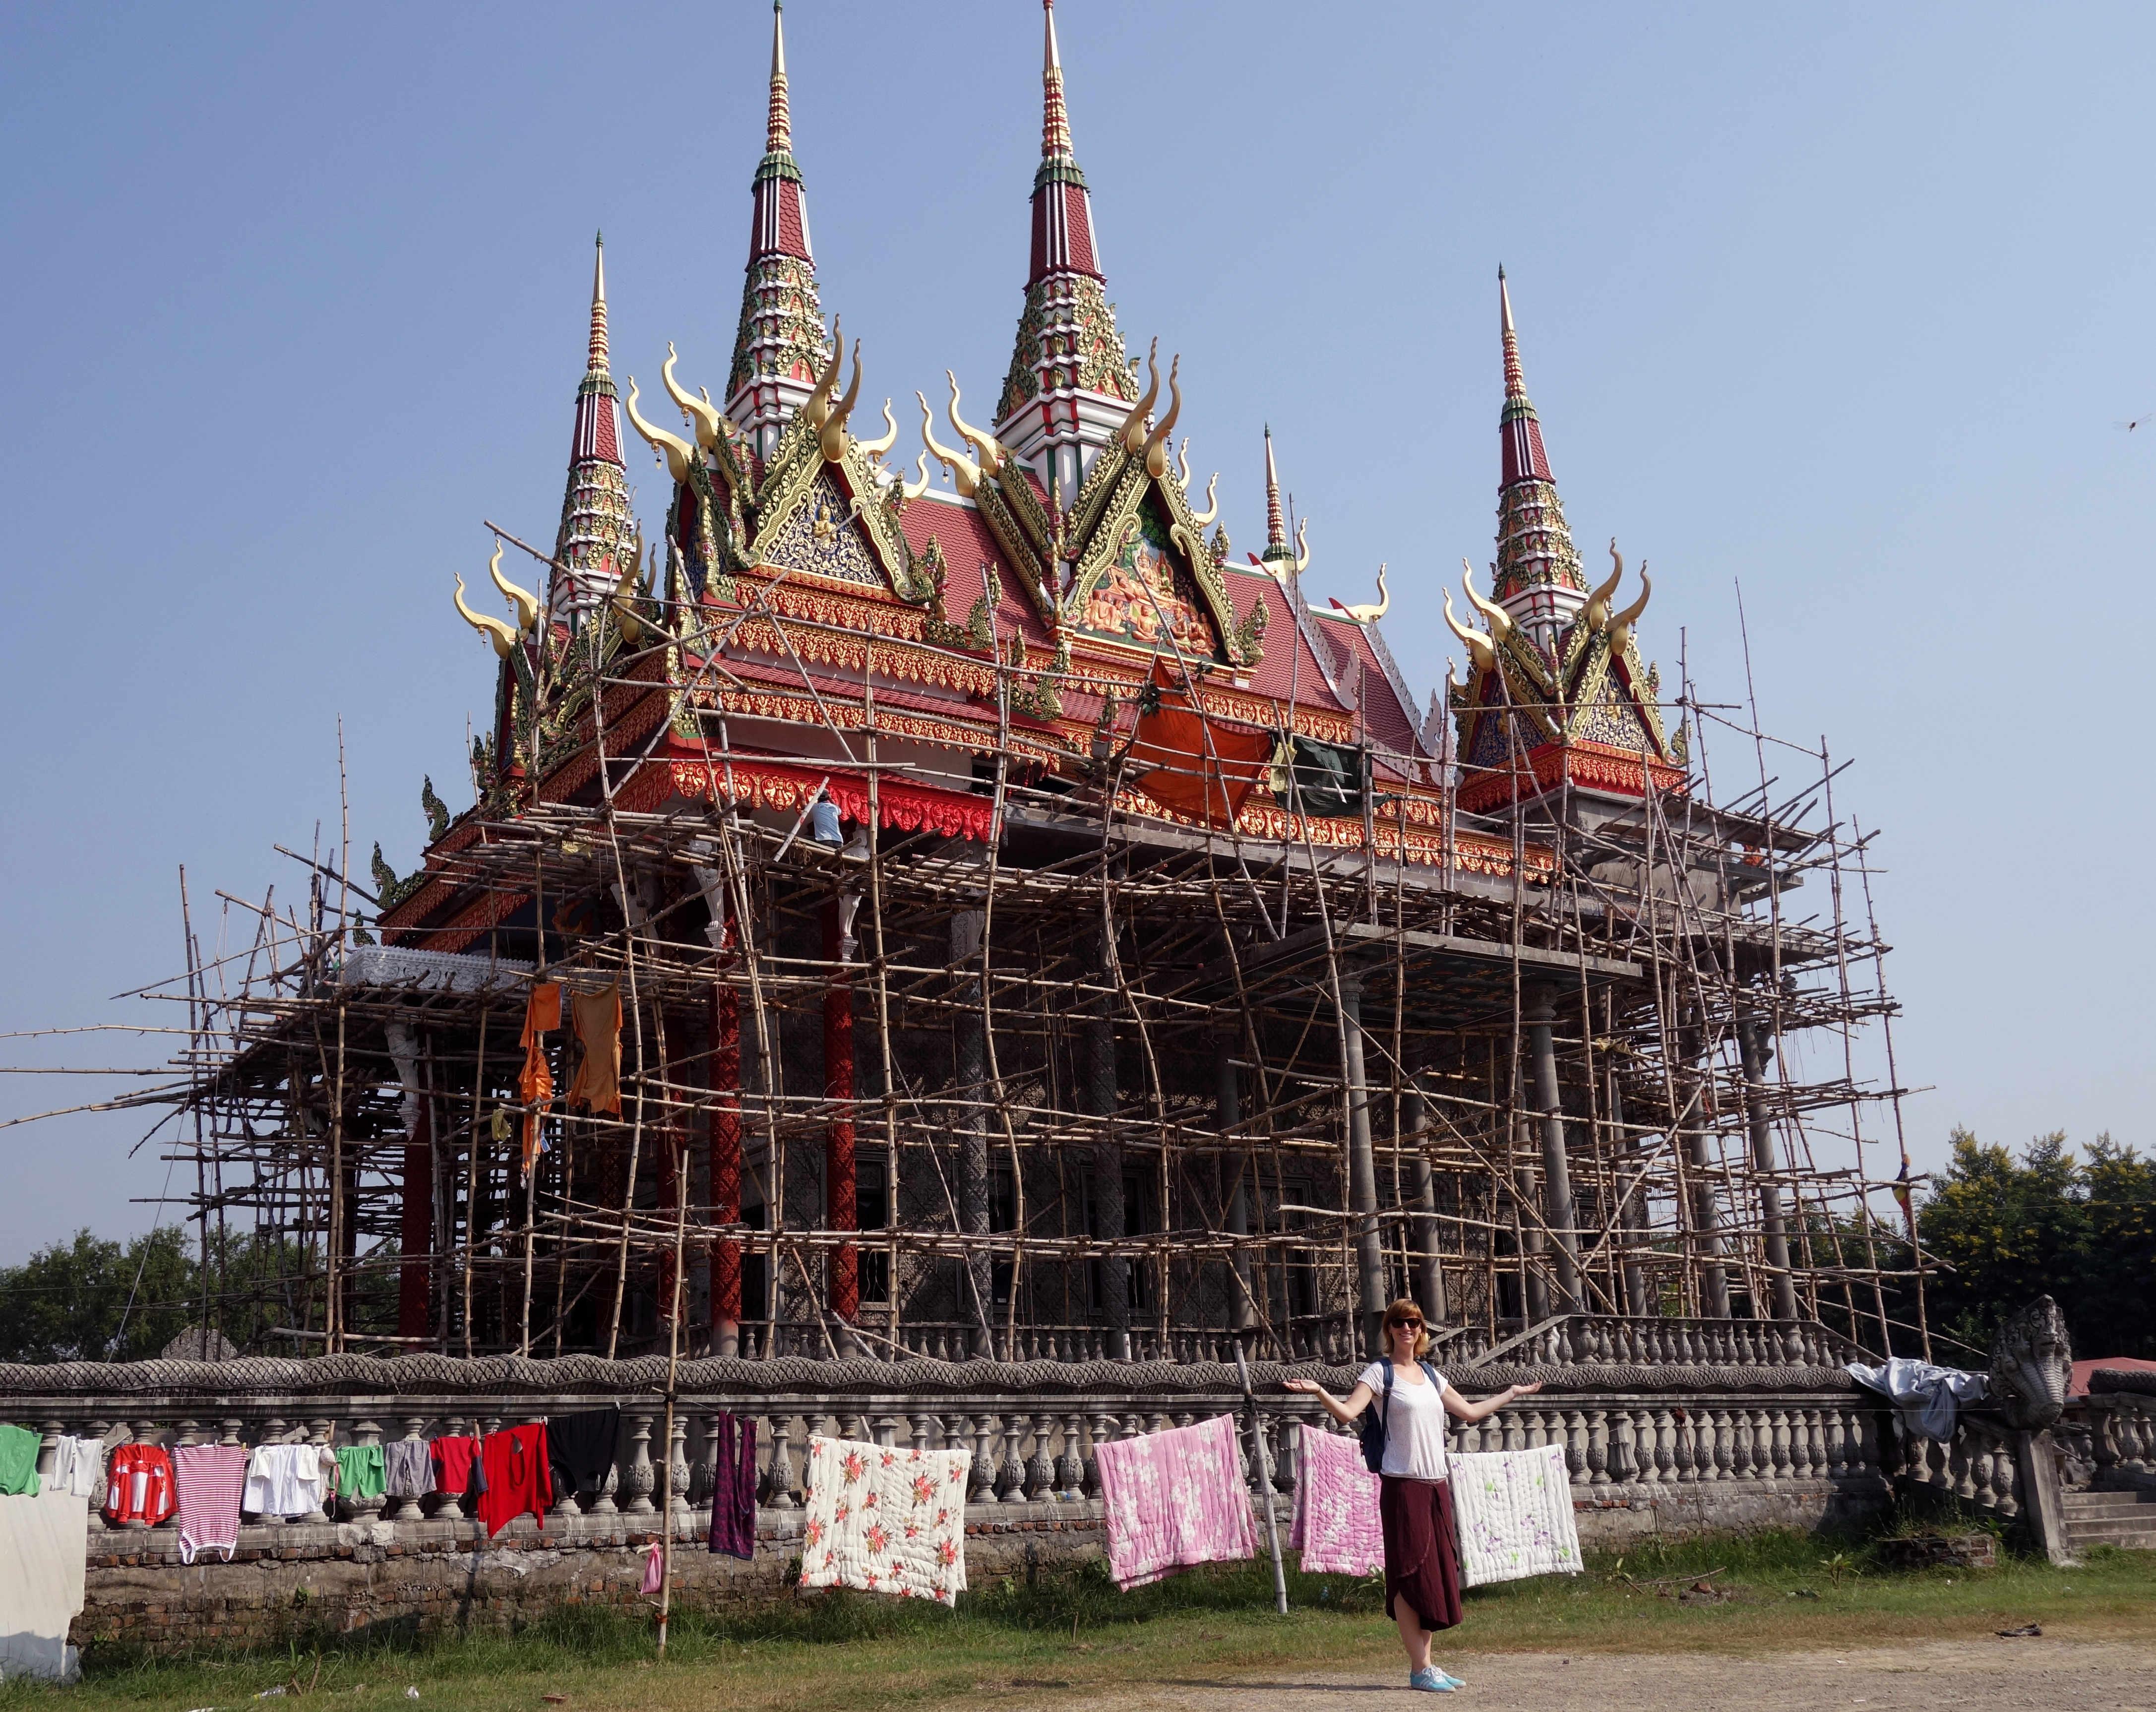 Nepal Lumbini Tempel Kambodscha Baugerüst